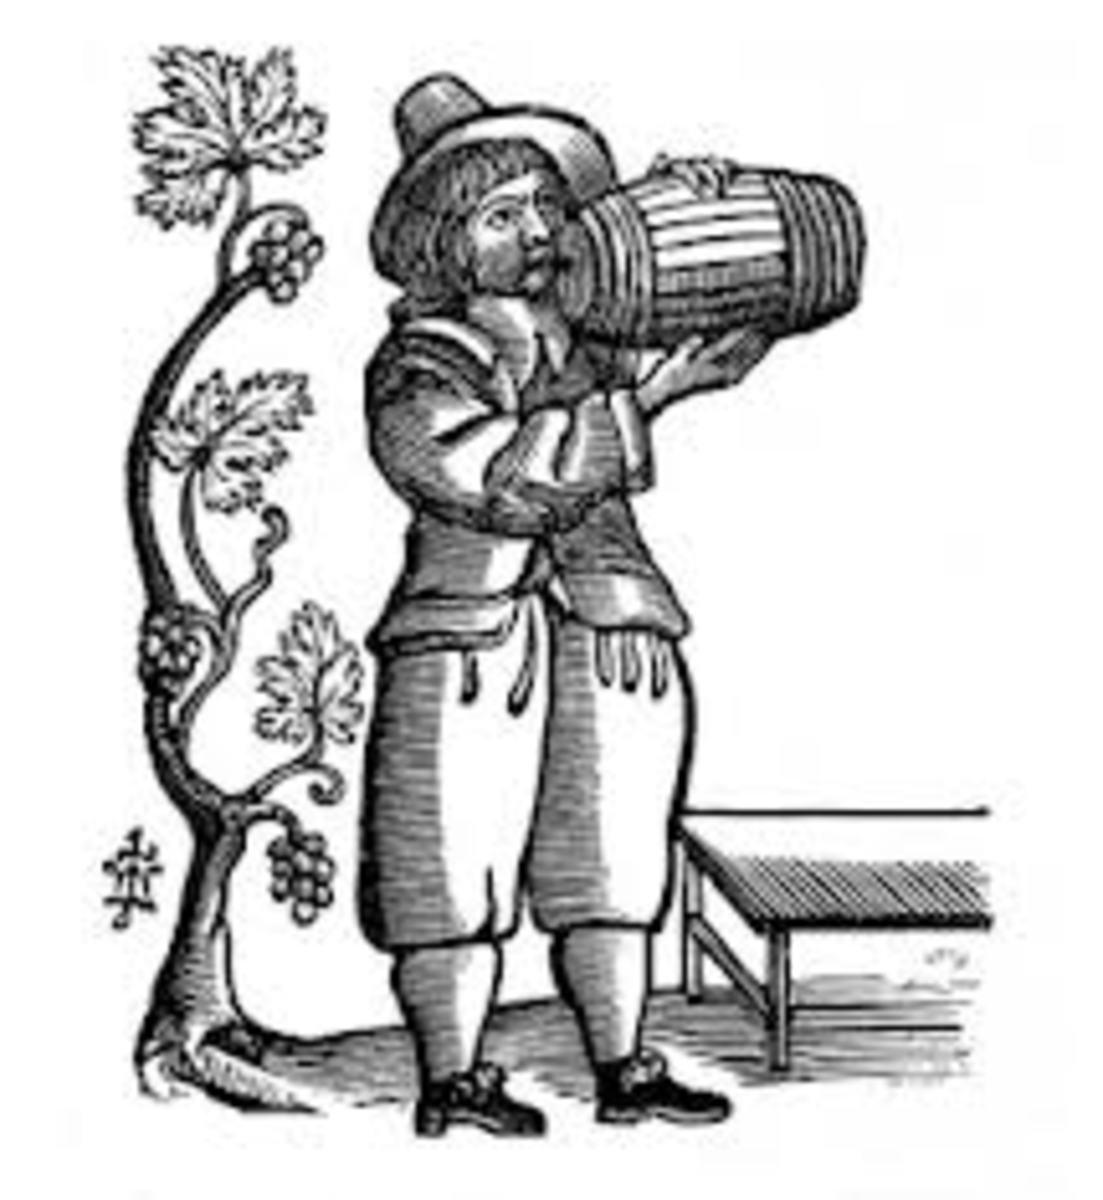 John Barleycorn -- English folk legend of the malts